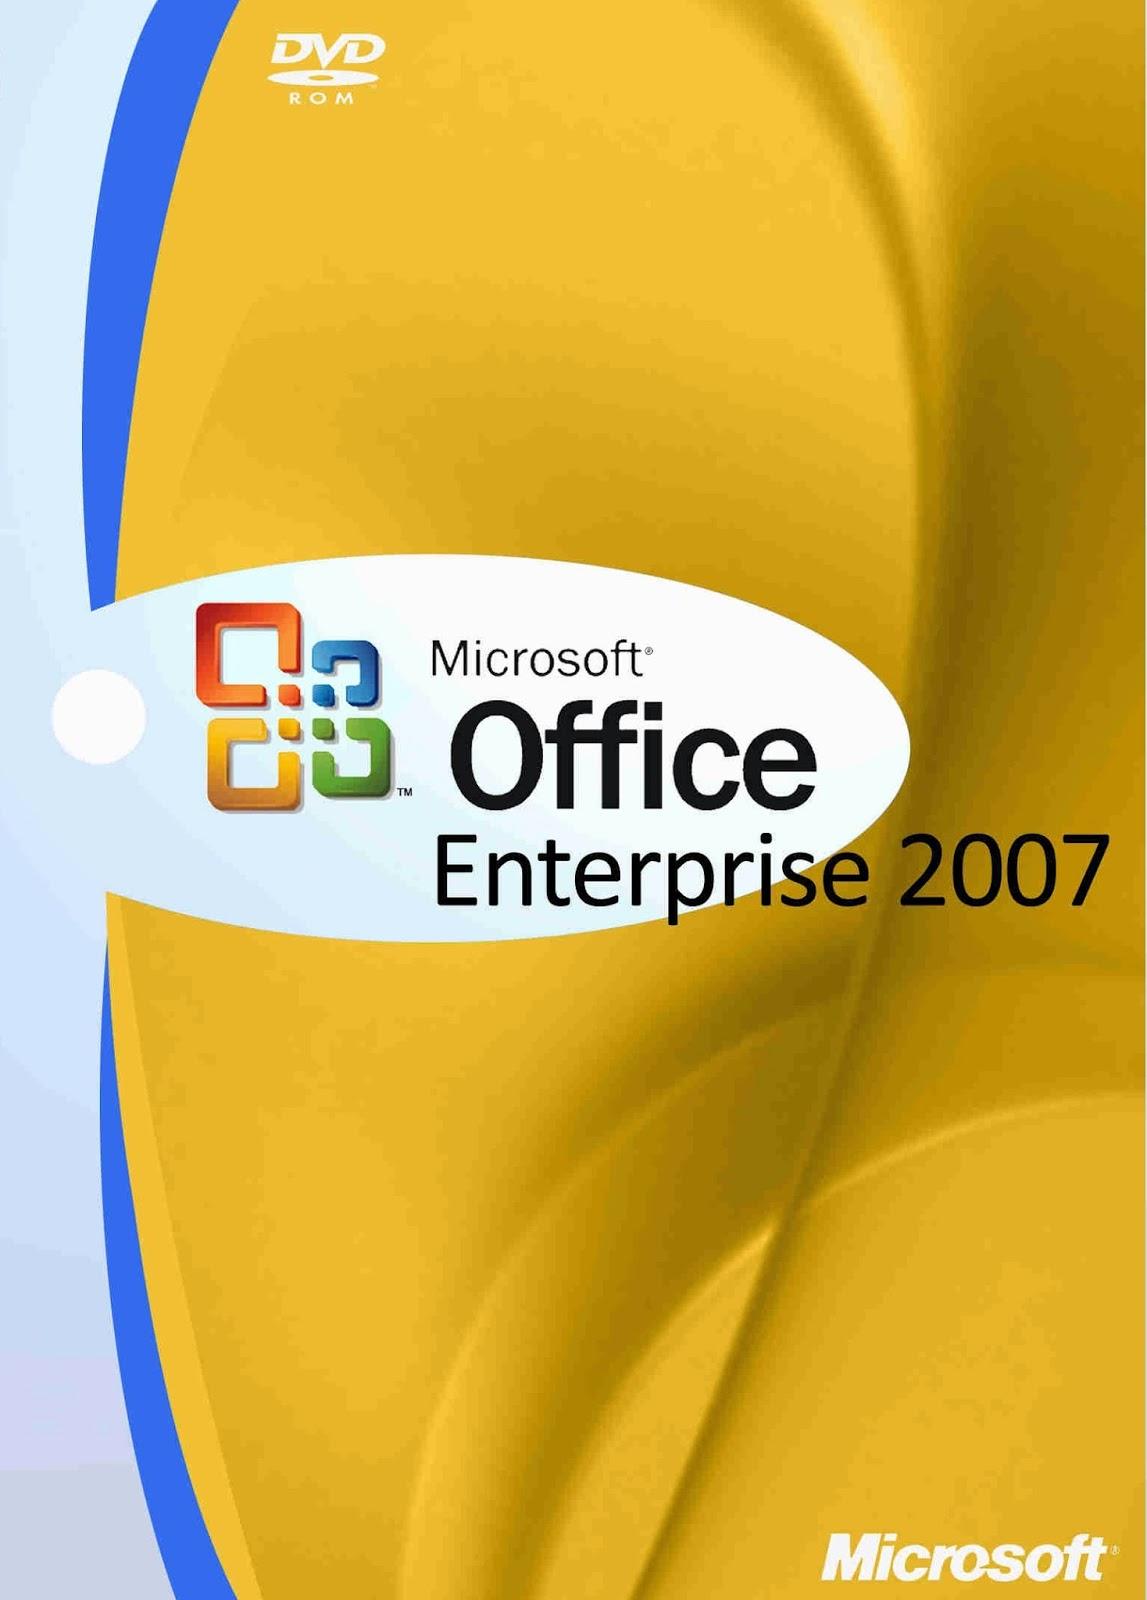 microsoft office enterprise 2007 full version download